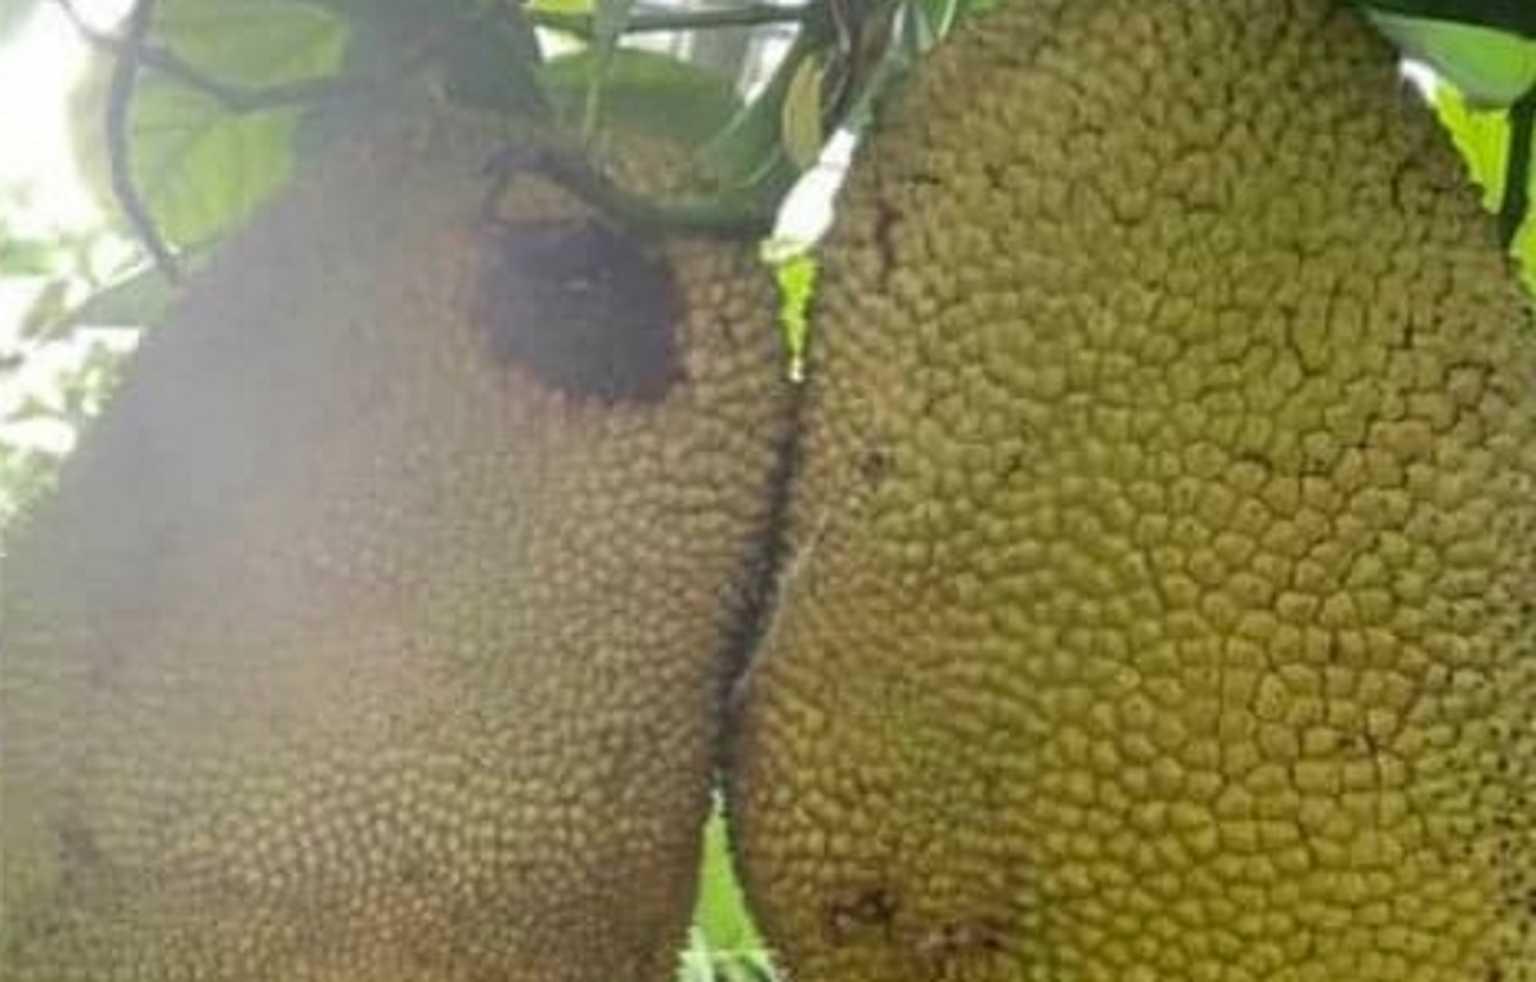 Jackfruit – Χανιά: Το εξωτικό φρούτο που κάνει πέρα ψωμί και κρέας (pics)